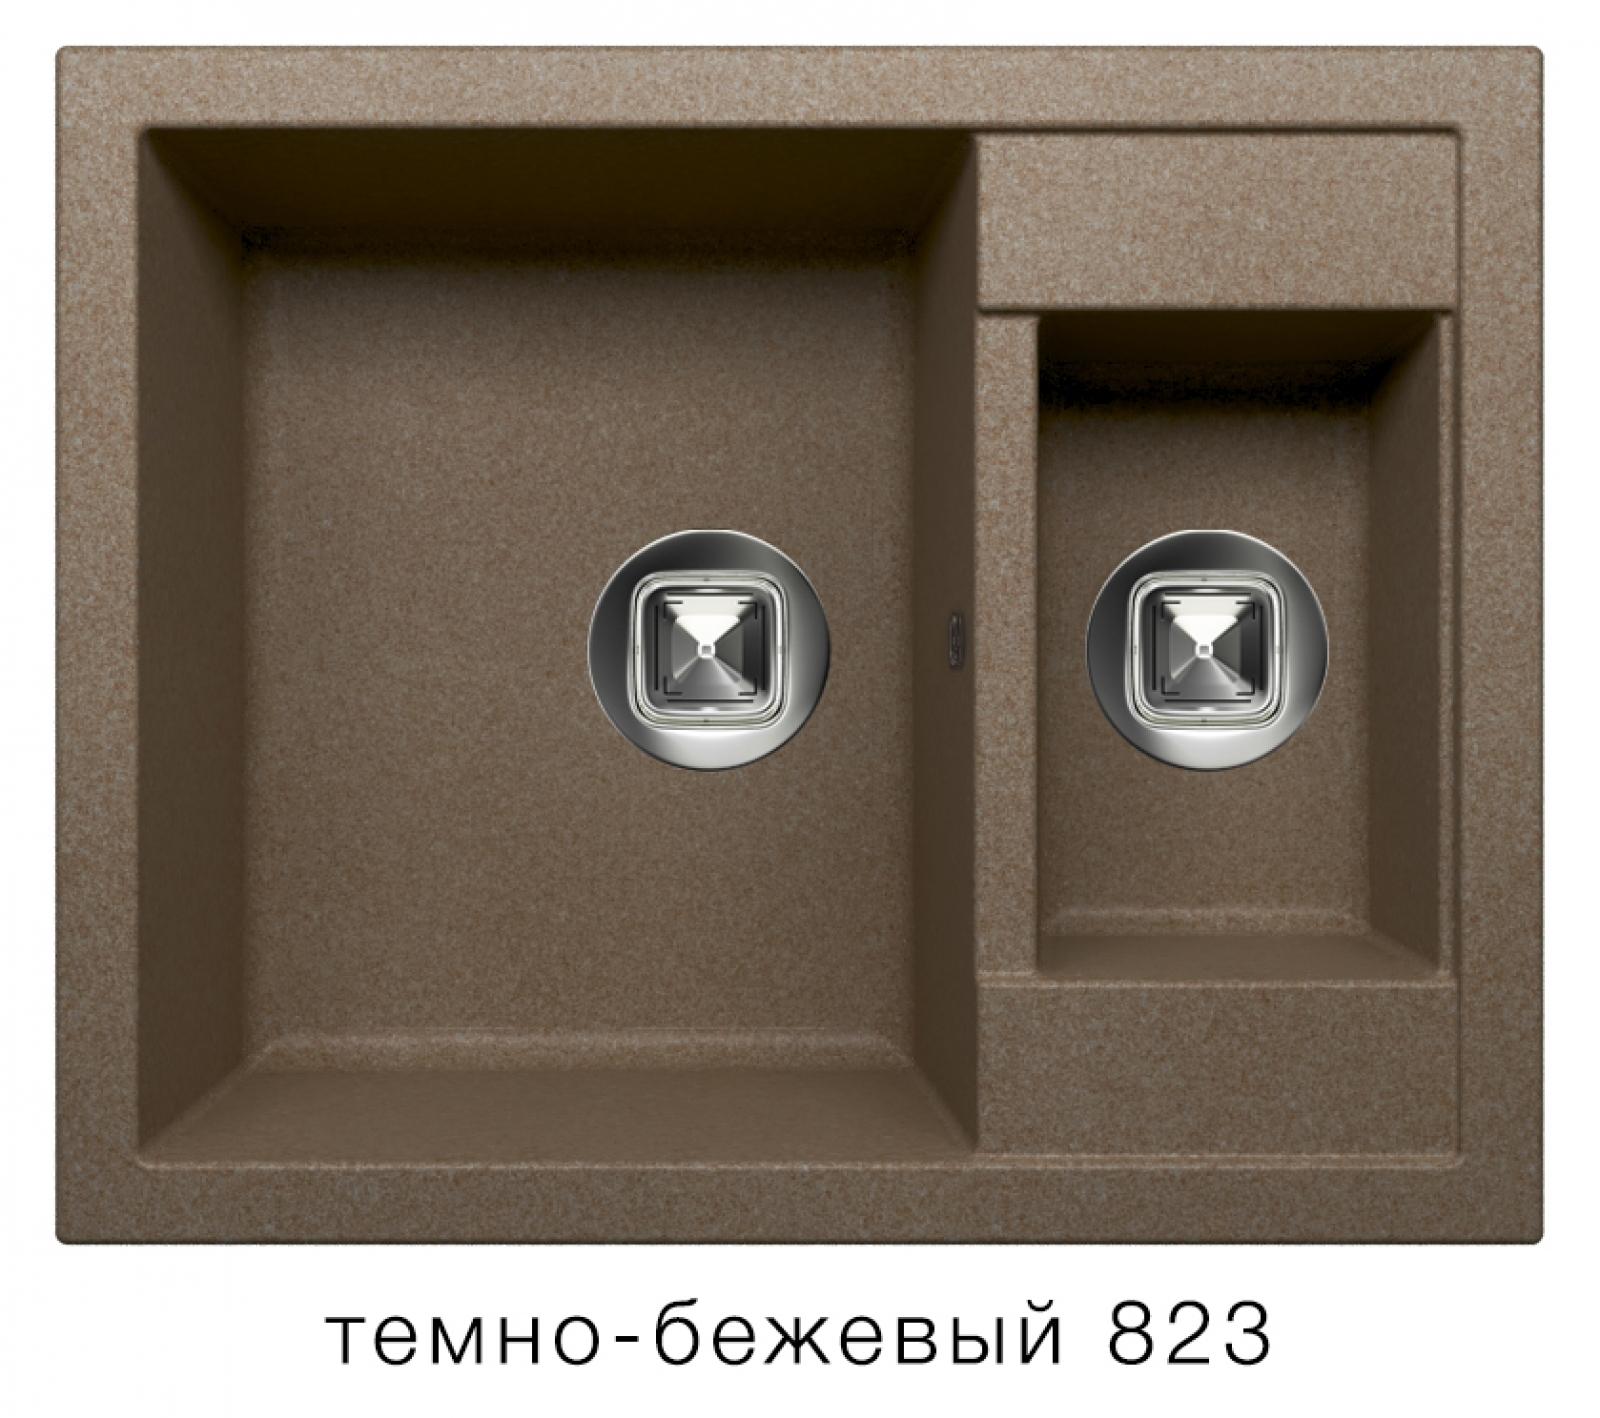 Мойка Tolero-R-109-823, цвет - Темно-бежевый